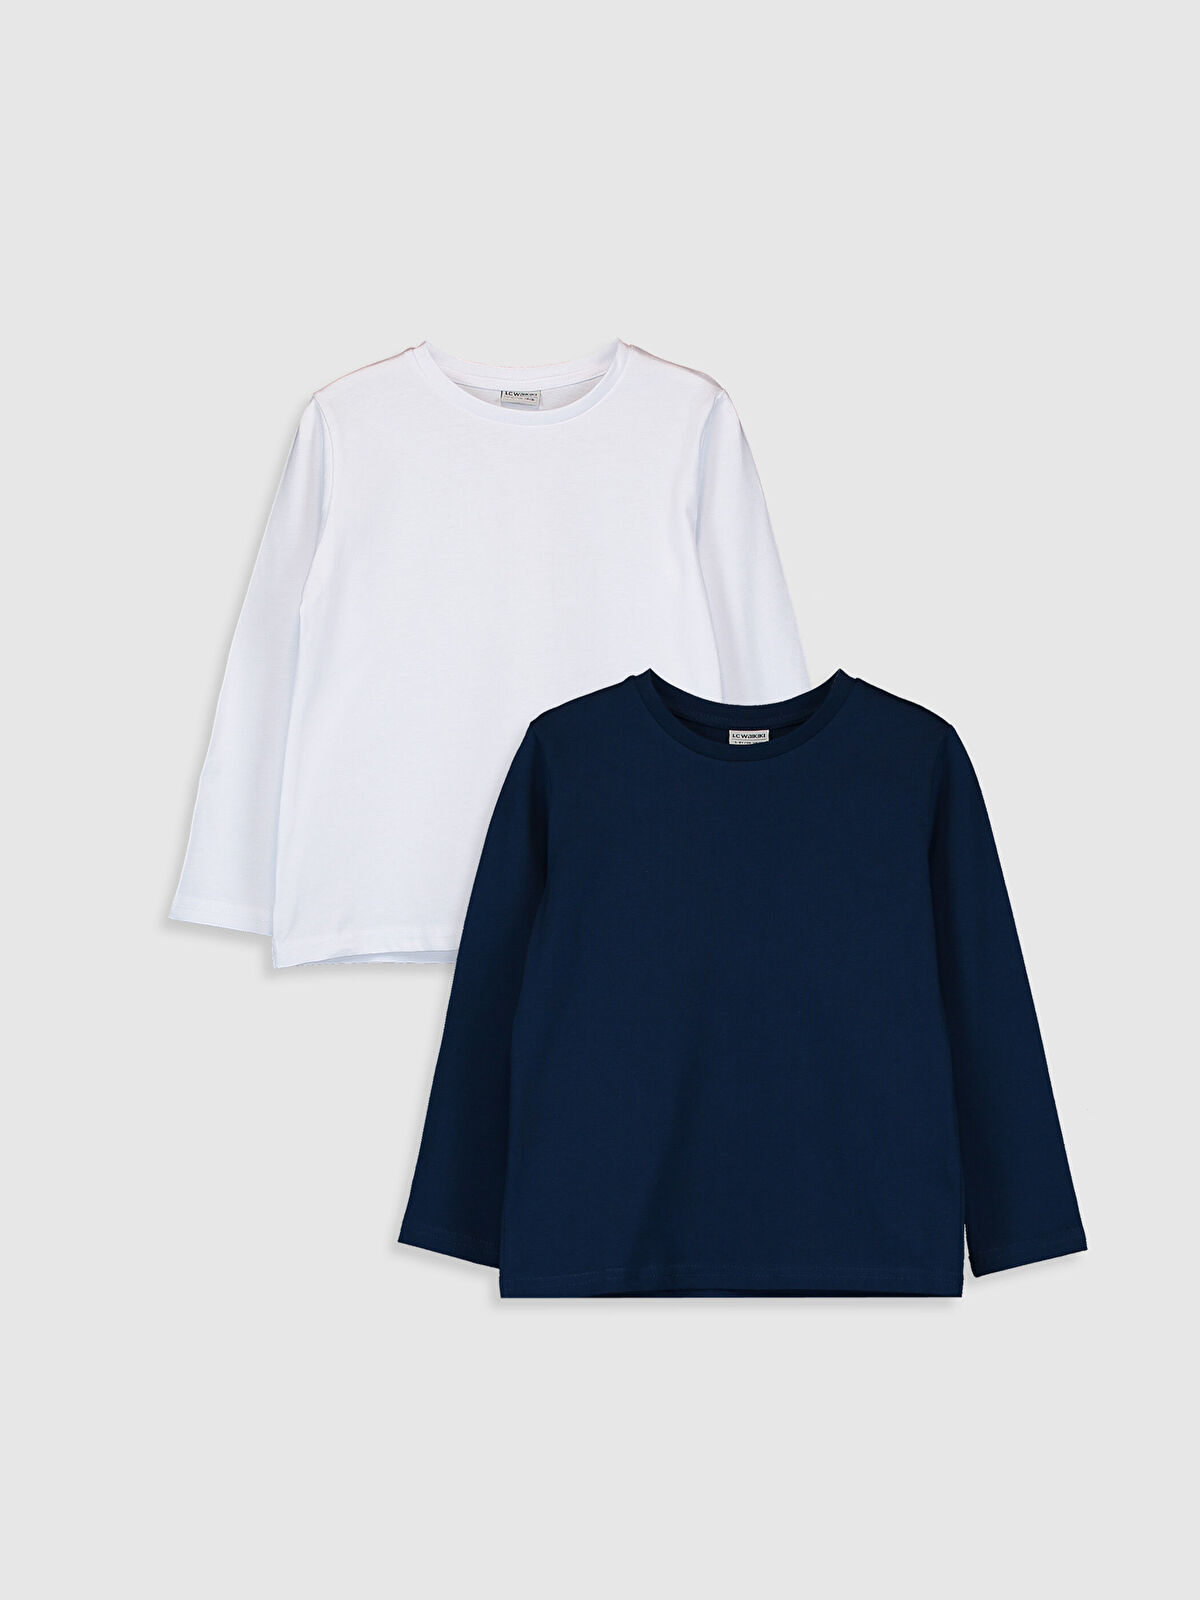 Erkek Çocuk Pamuklu Basic Tişört 2'li - LC WAIKIKI